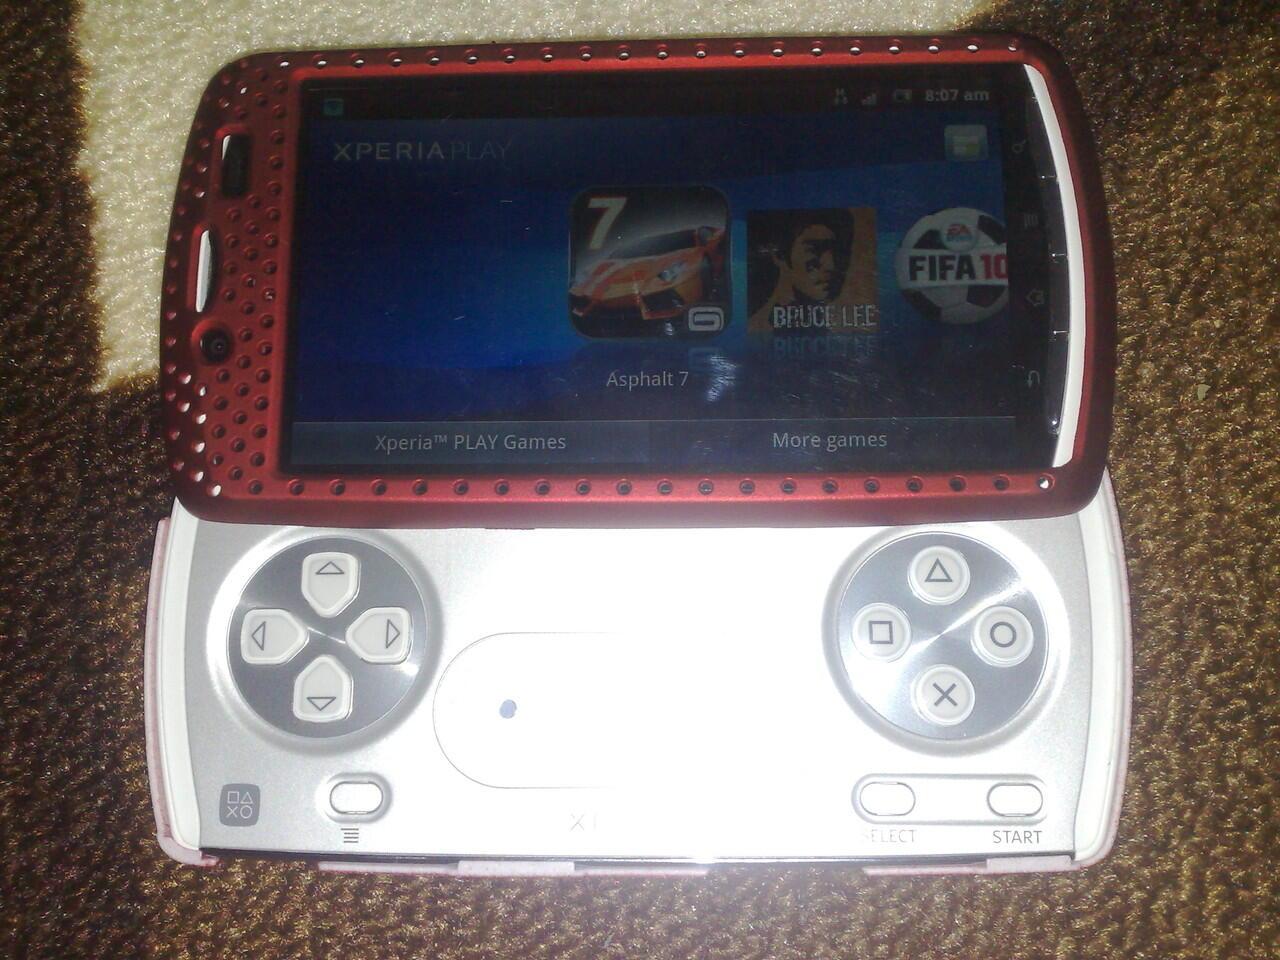 WTS -> Sony Xperia Play R800i (GSM) batangan